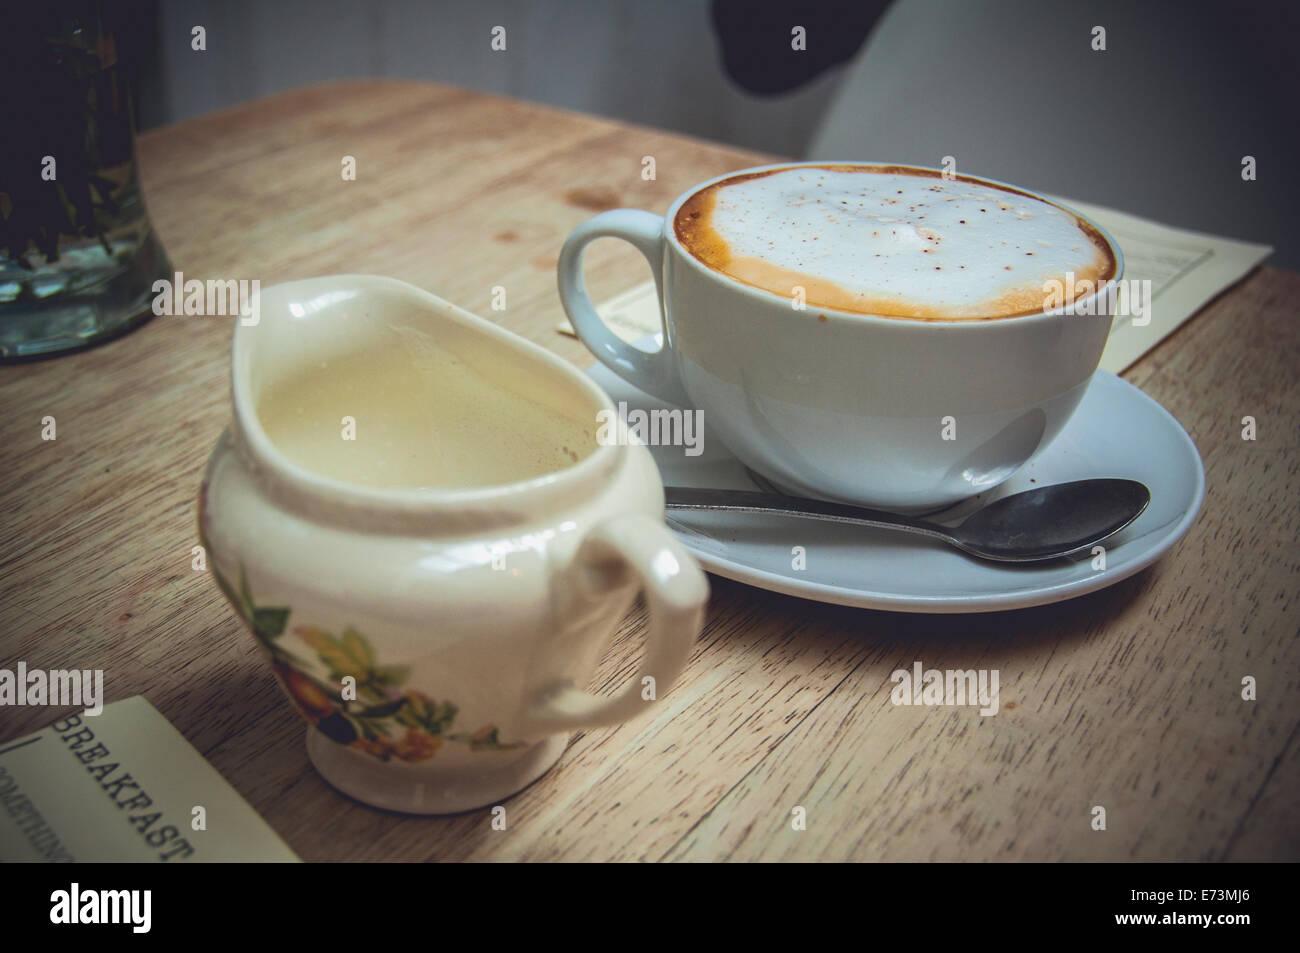 morning-coffee-cup-E73MJ6.jpg